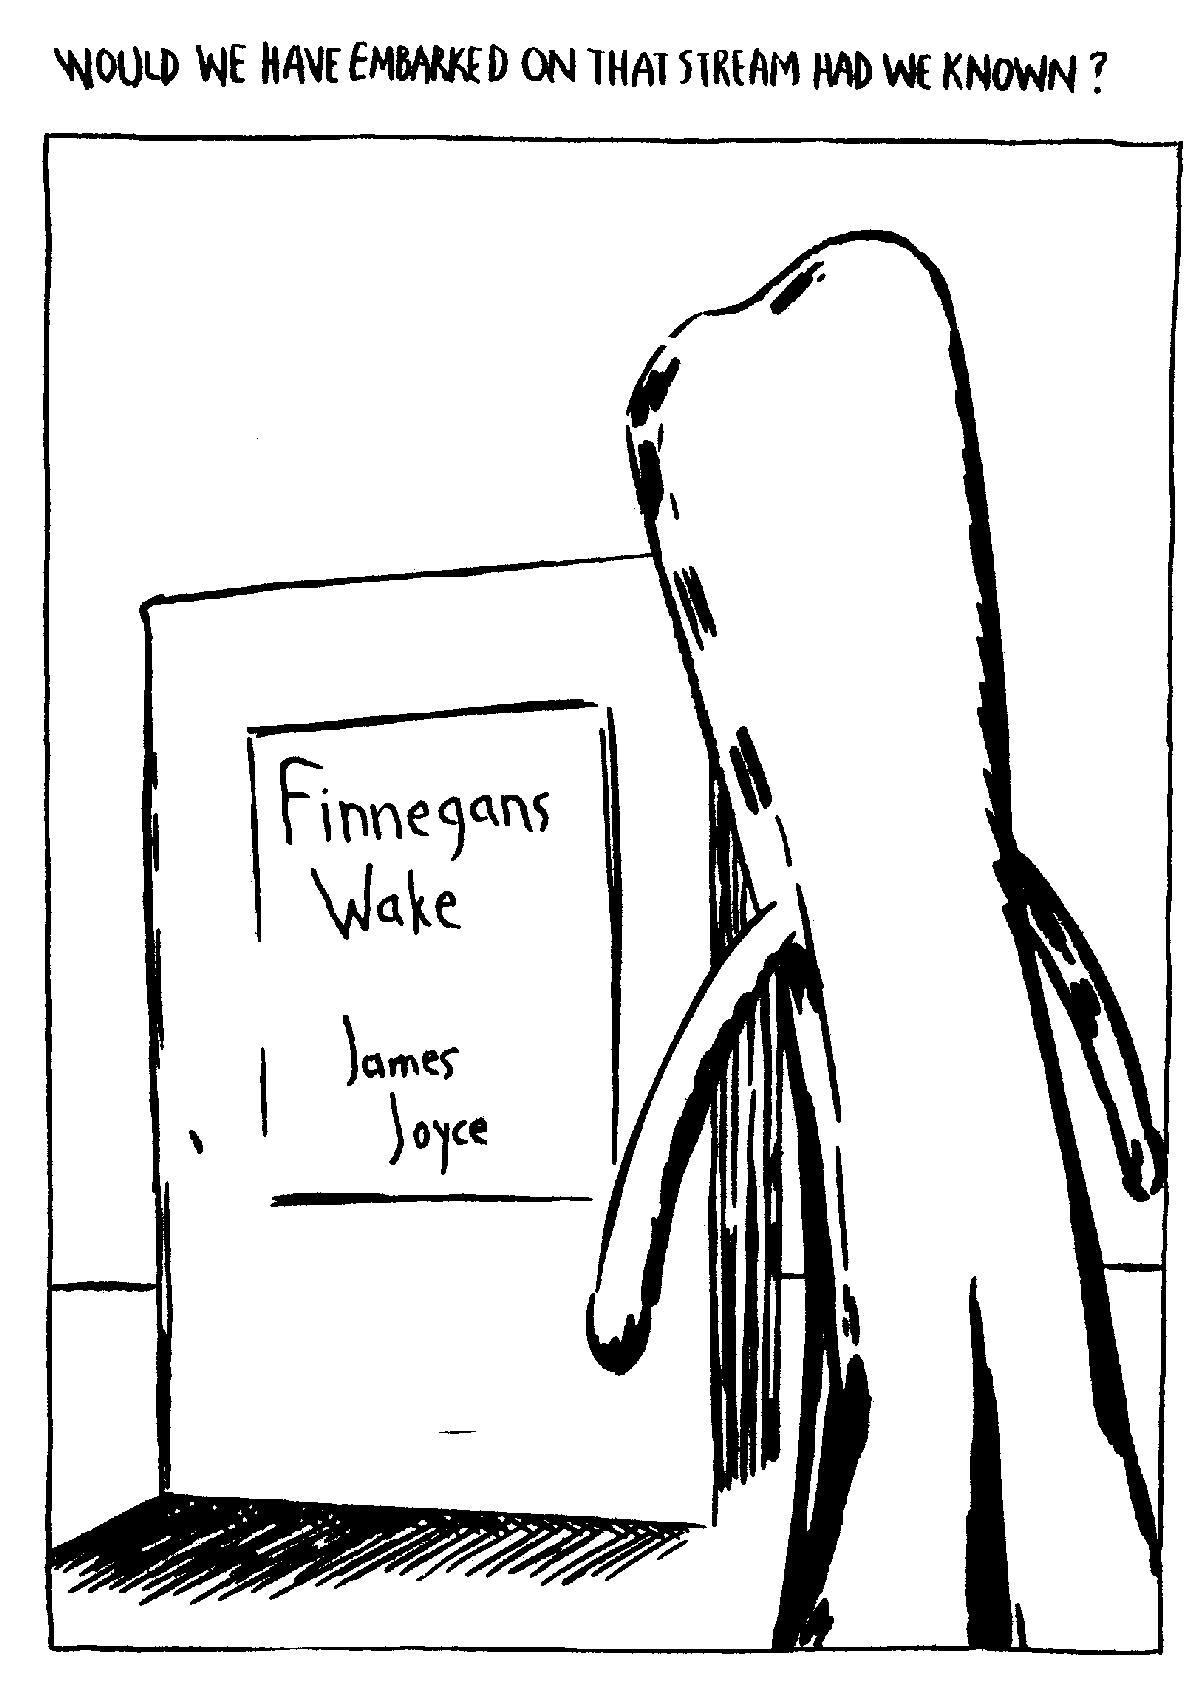 Hear a Reading of James Joyce's Finnegans Wake Set to